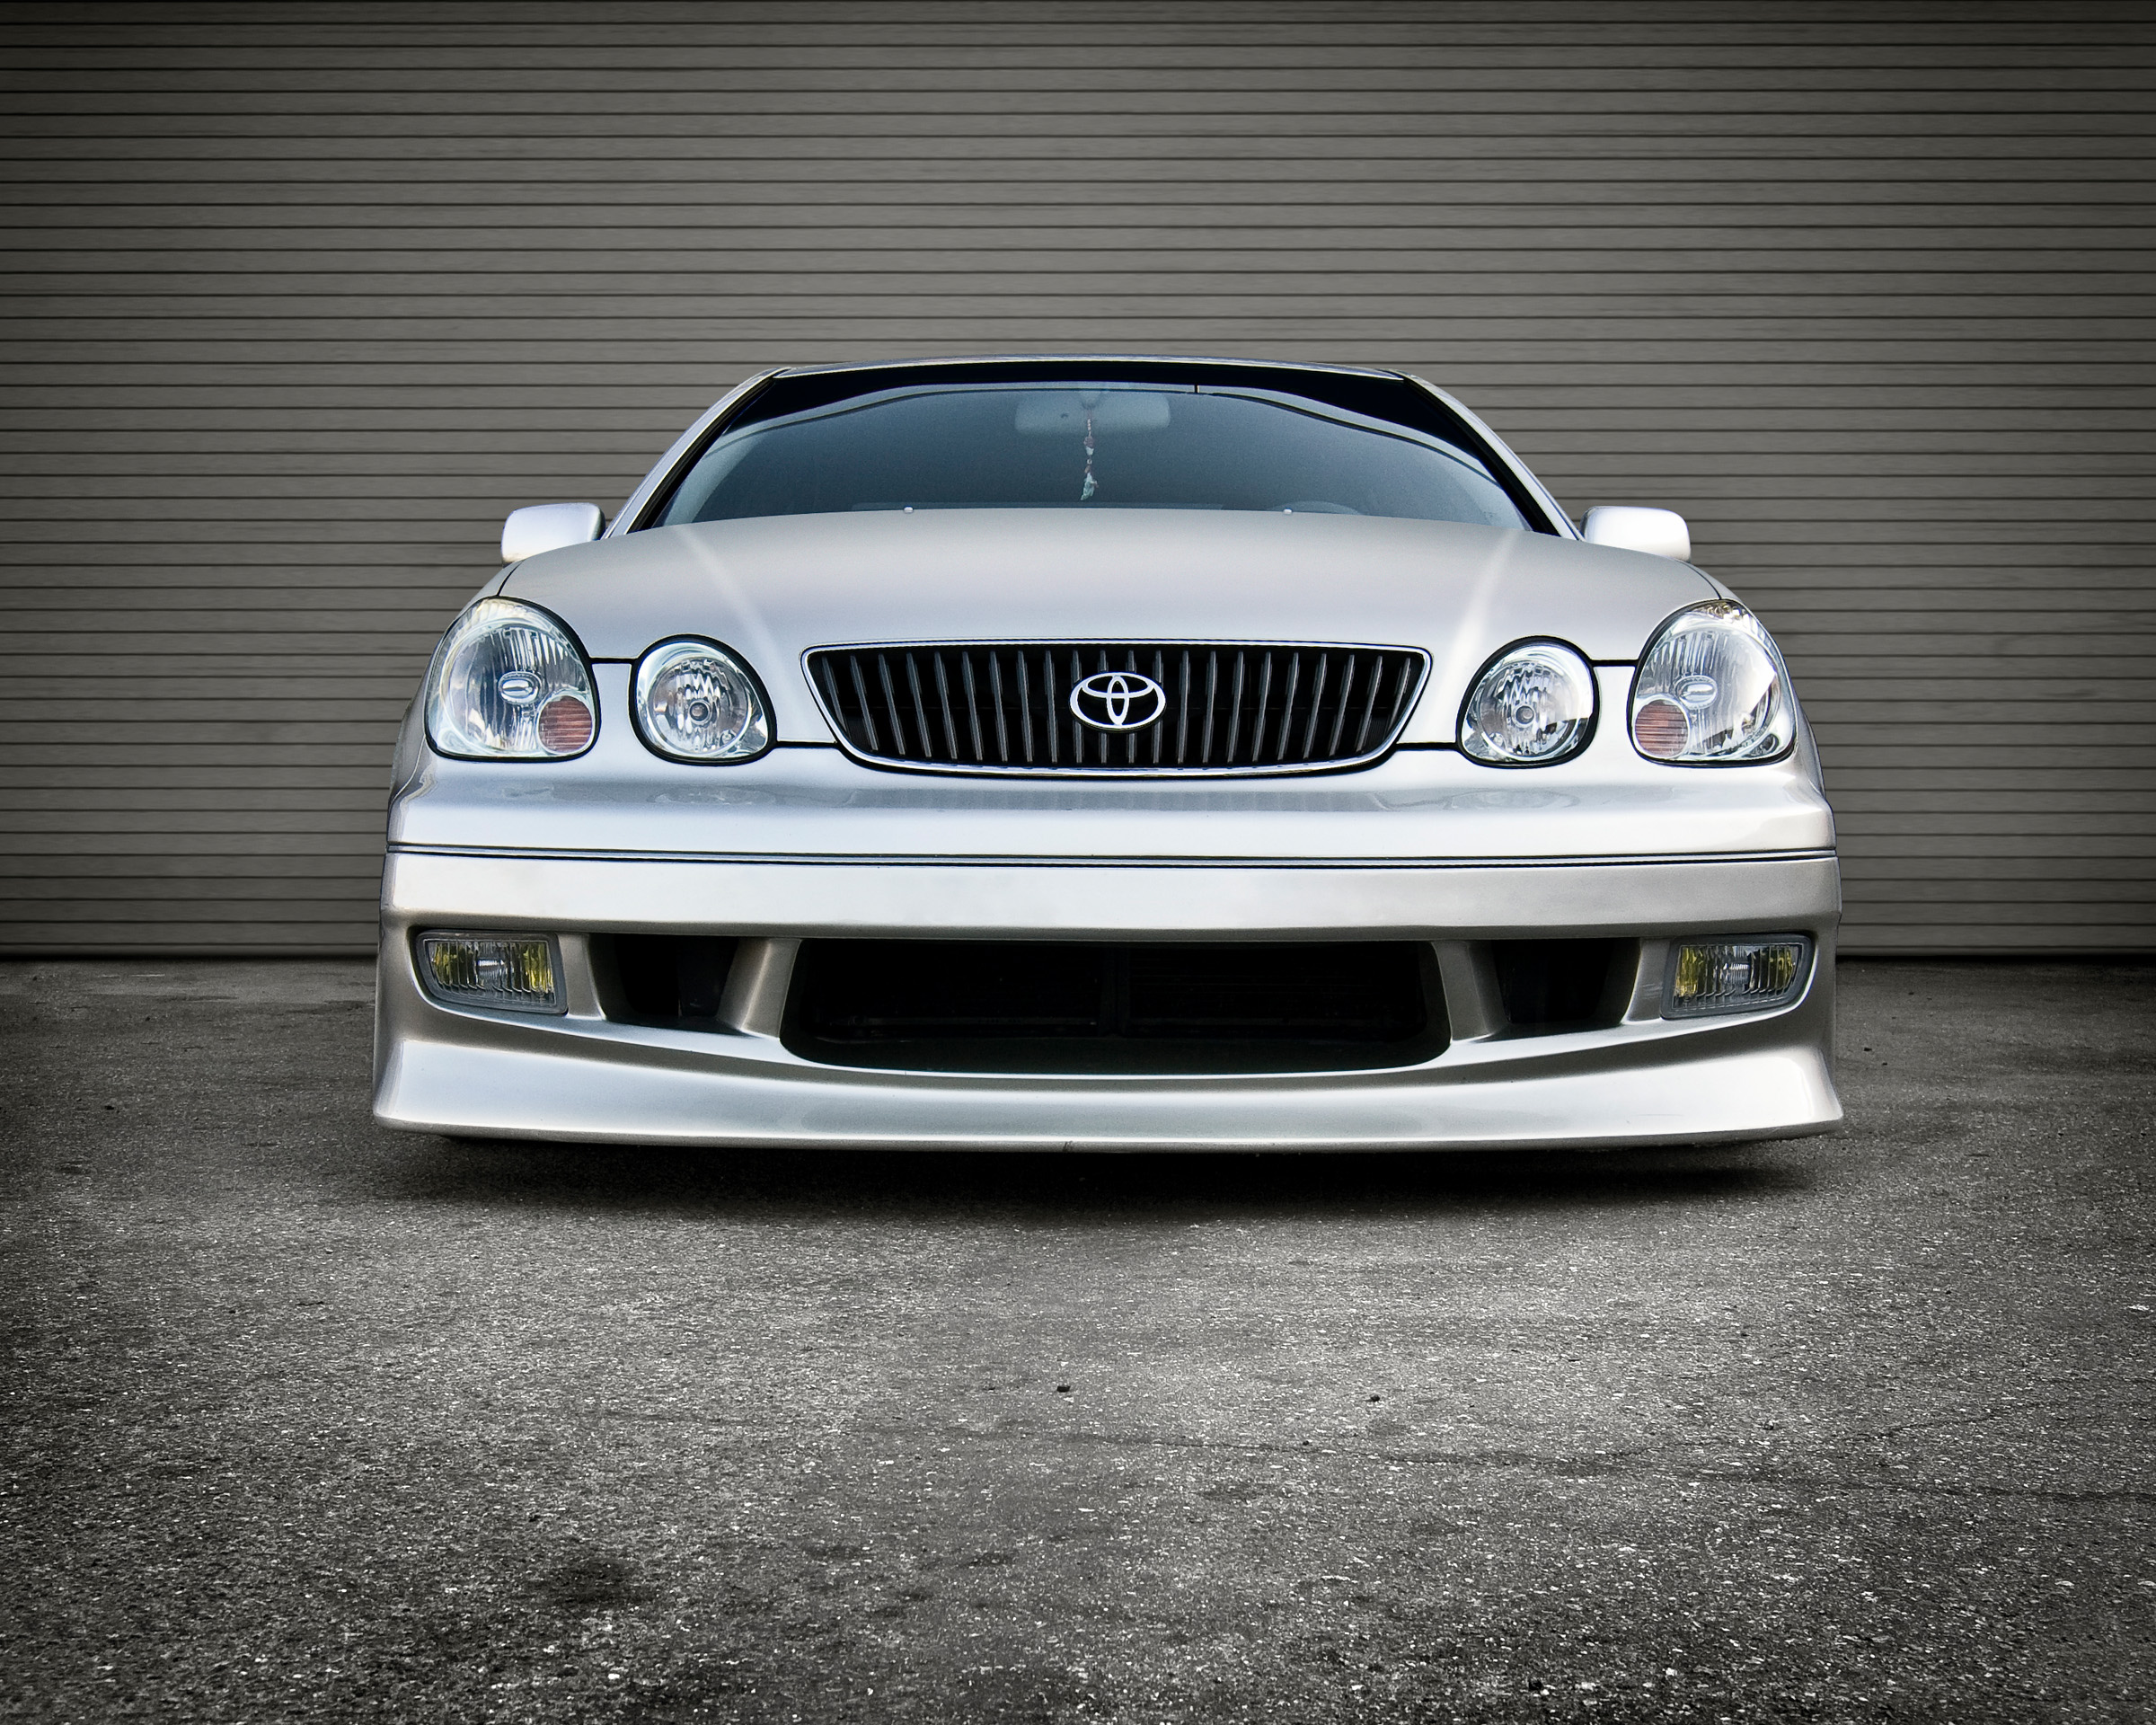 ludwig_ortiz_automotive_0004.jpg